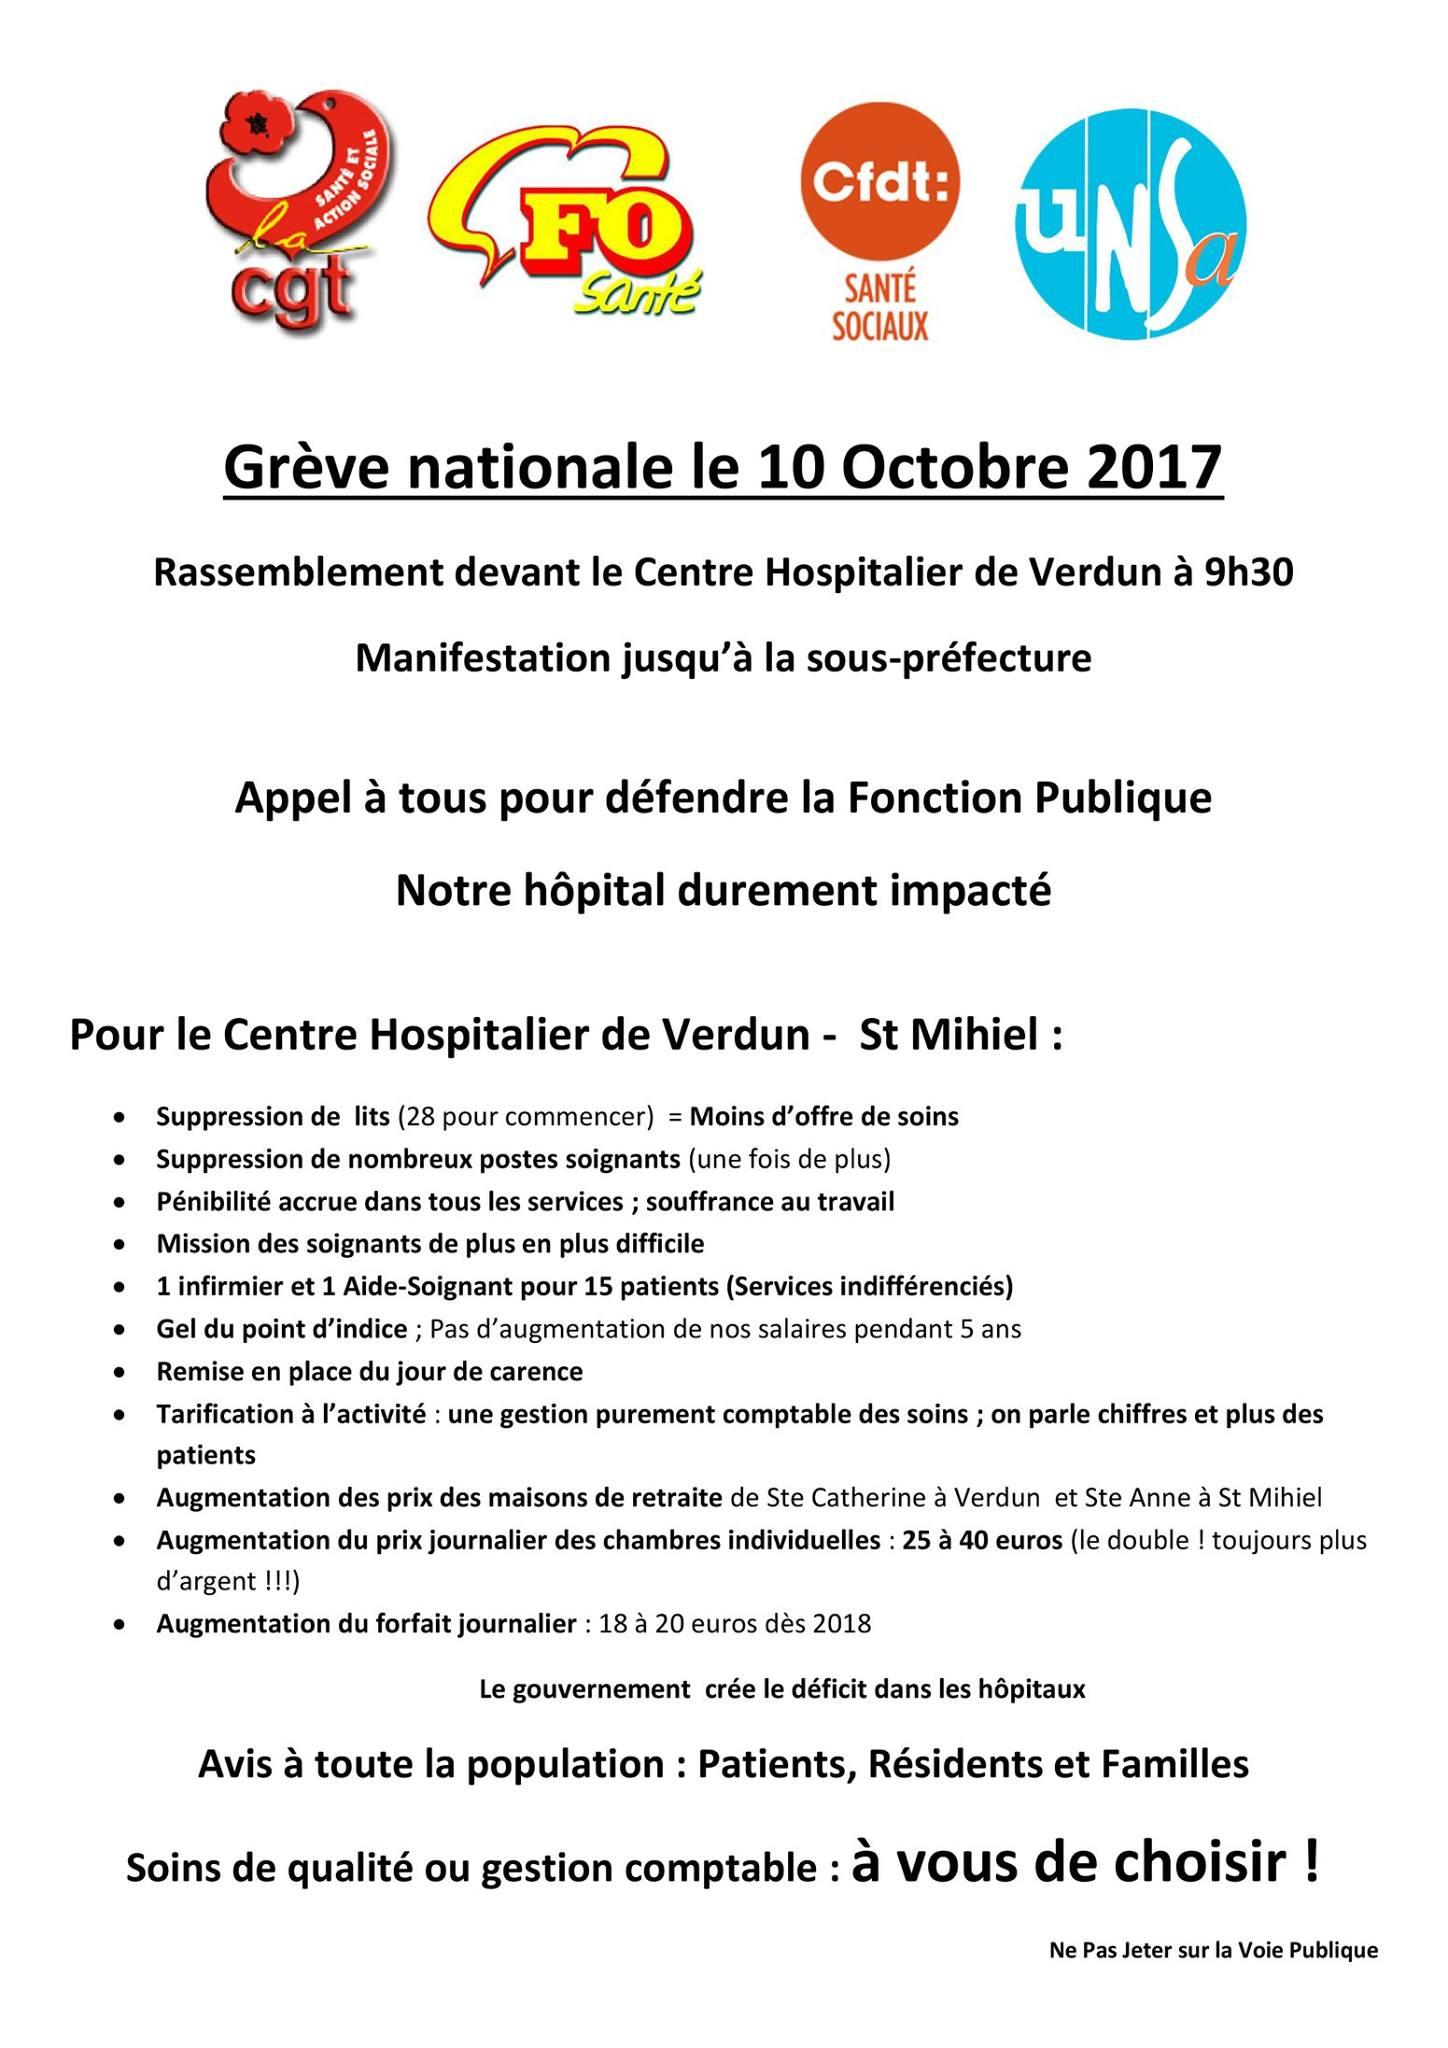 Manifestation du 10 octobre 2017 cgt centre hospitalier - Grille indiciaire ingenieur principal ...